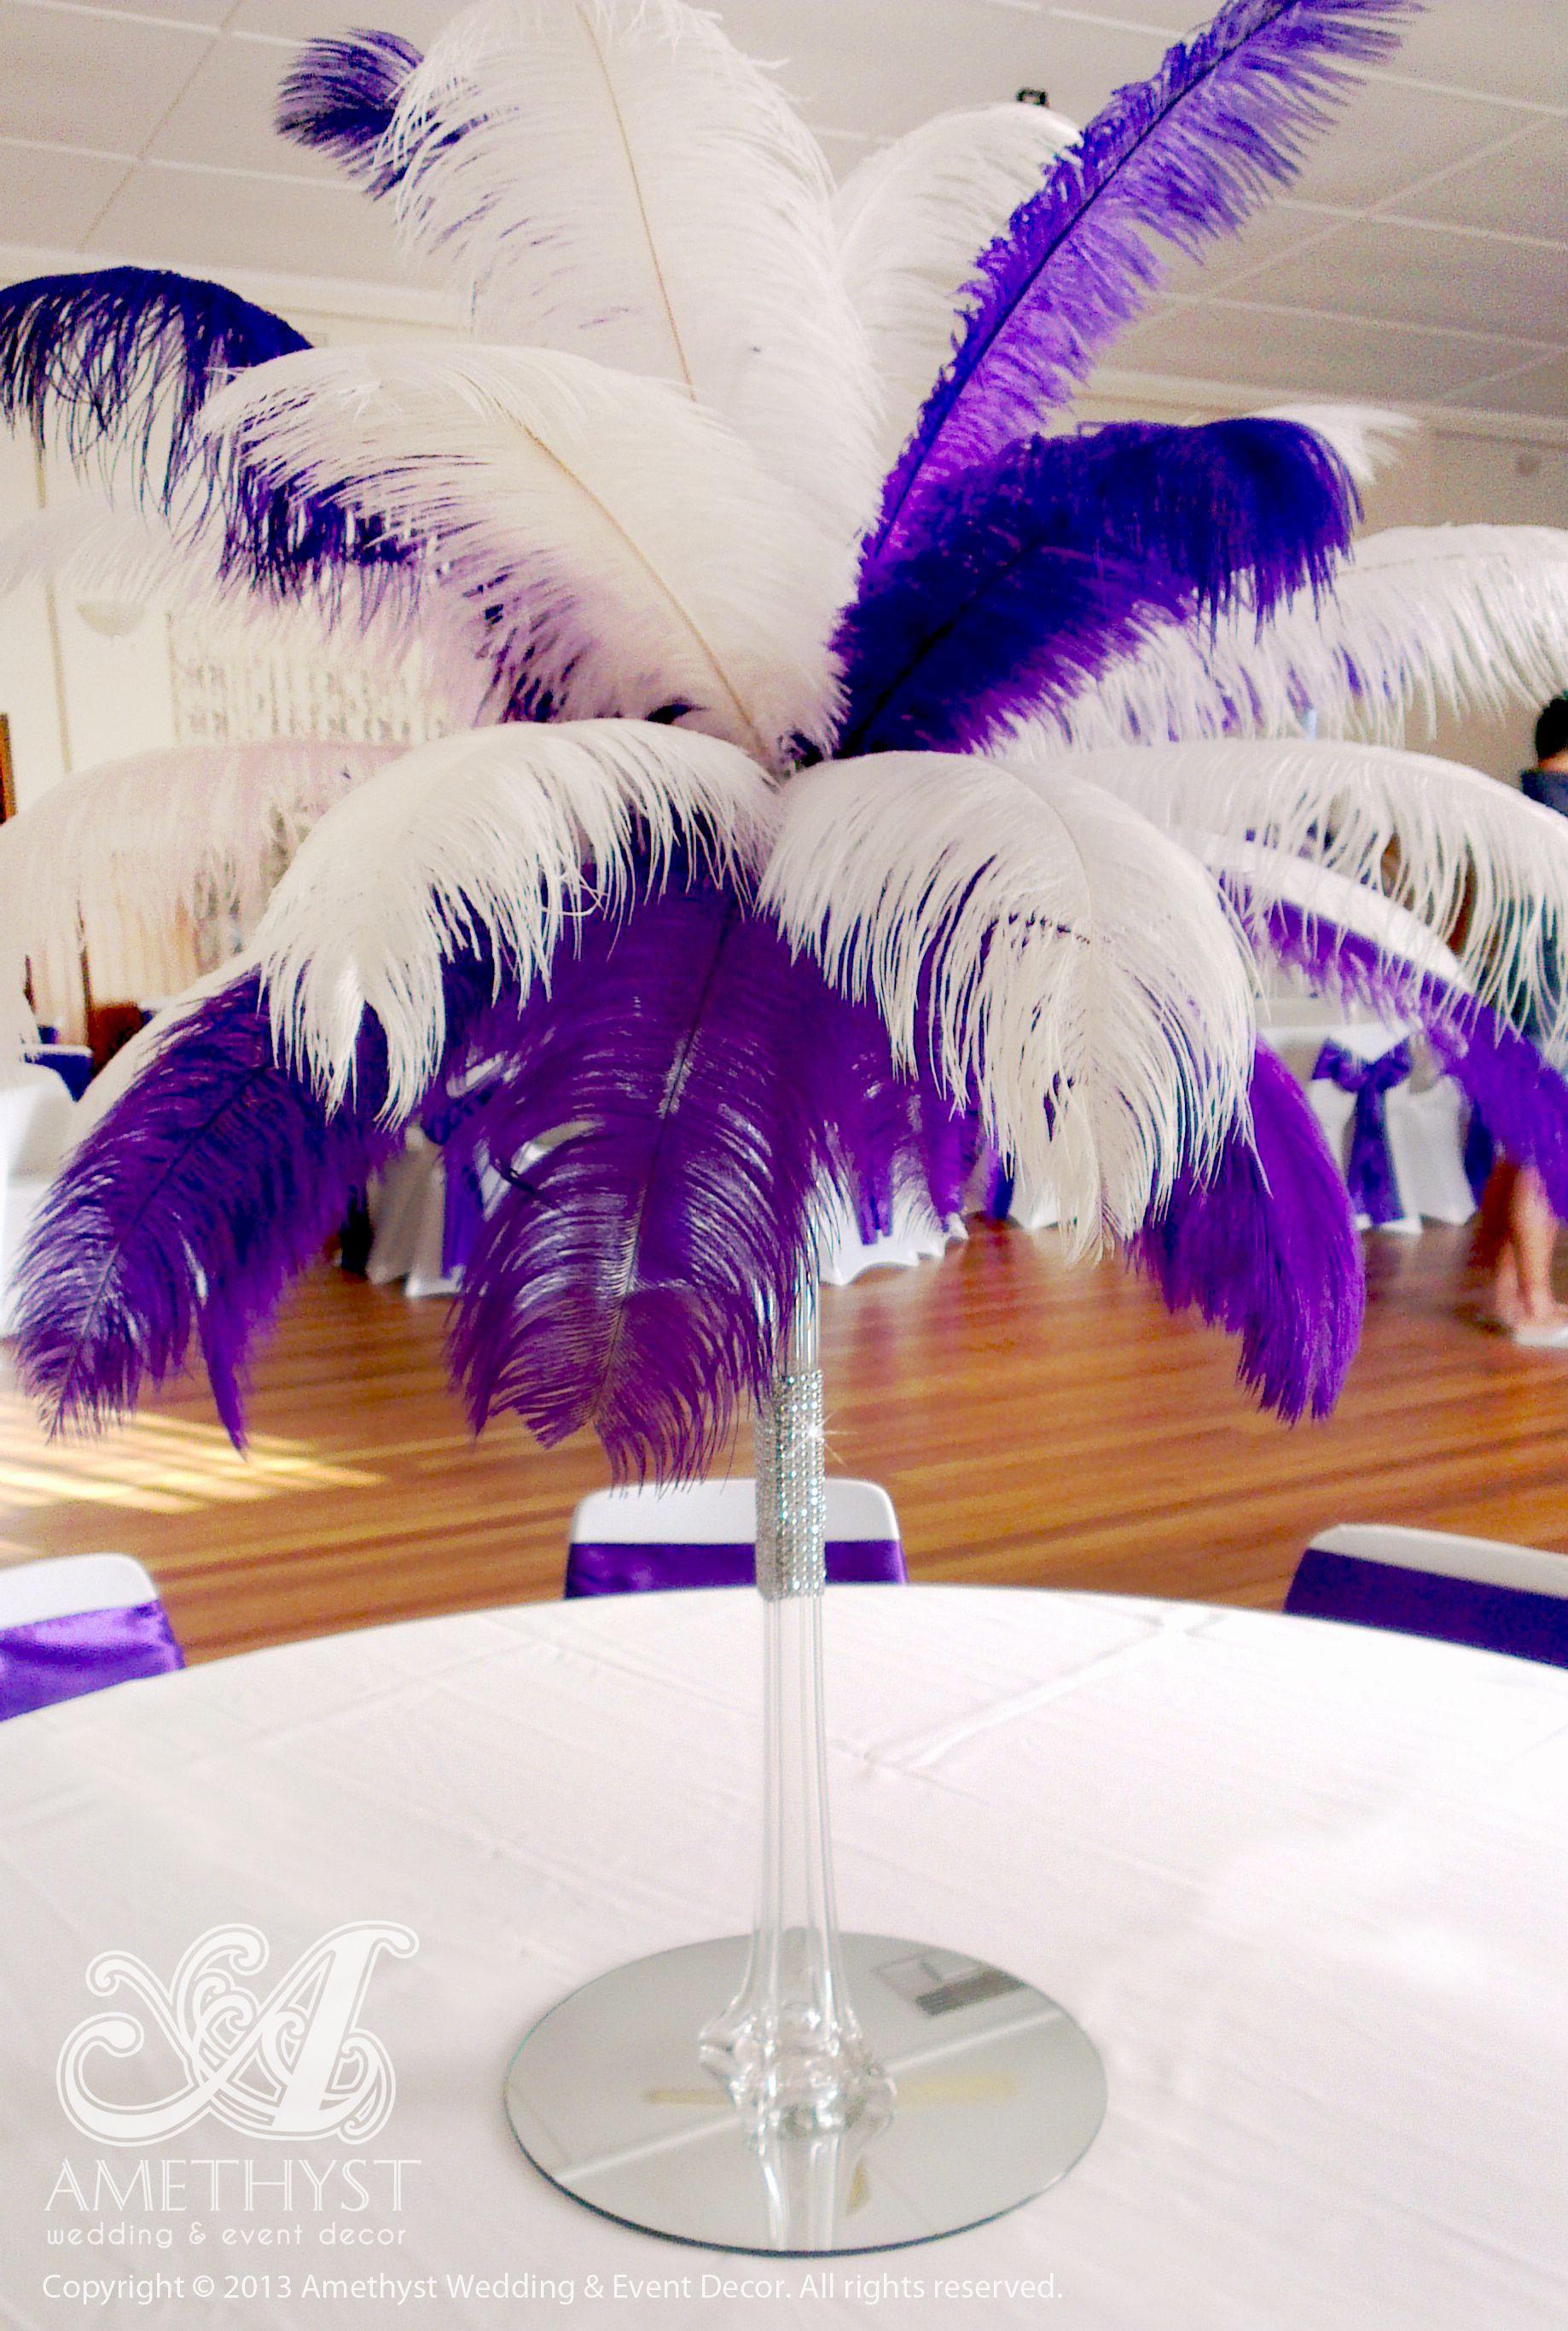 16 inch vase centerpieces of centerpiece package 60cm clear eiffel vase with purple white inside centerpiece package 60cm clear eiffel vase with purple white ostrich feathers diamante mesh 30cm mirror base